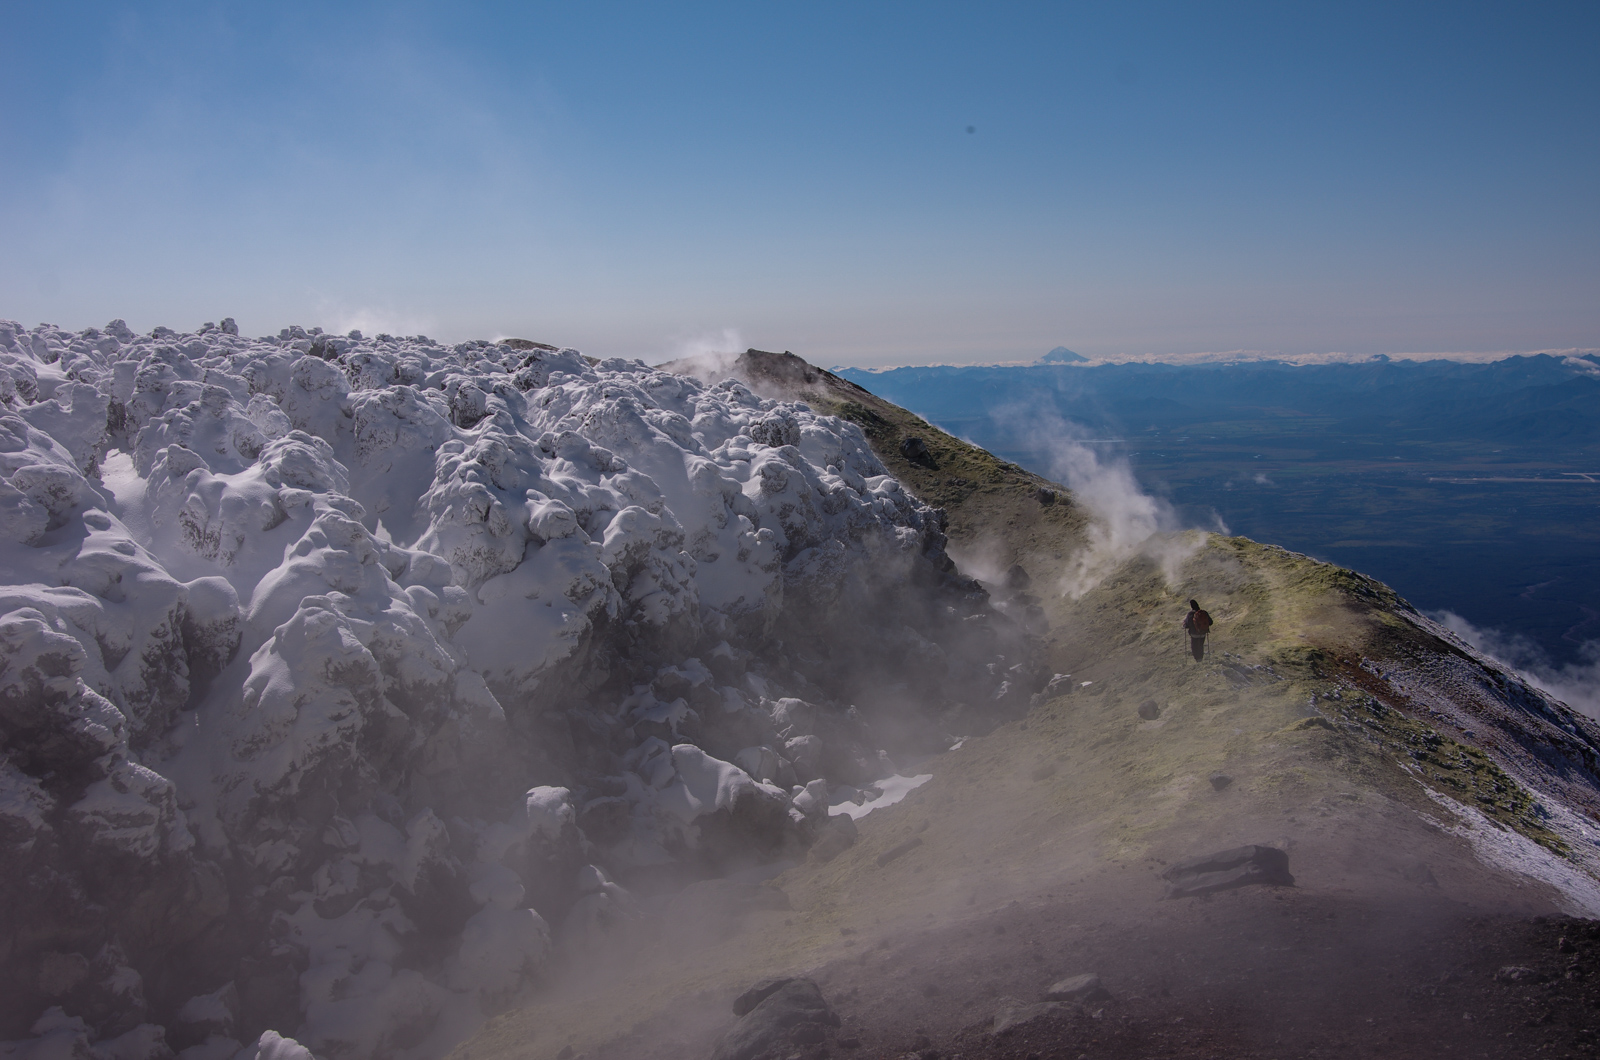 Summit of the Avacha volcano, Kamchatka, Far East Russia.